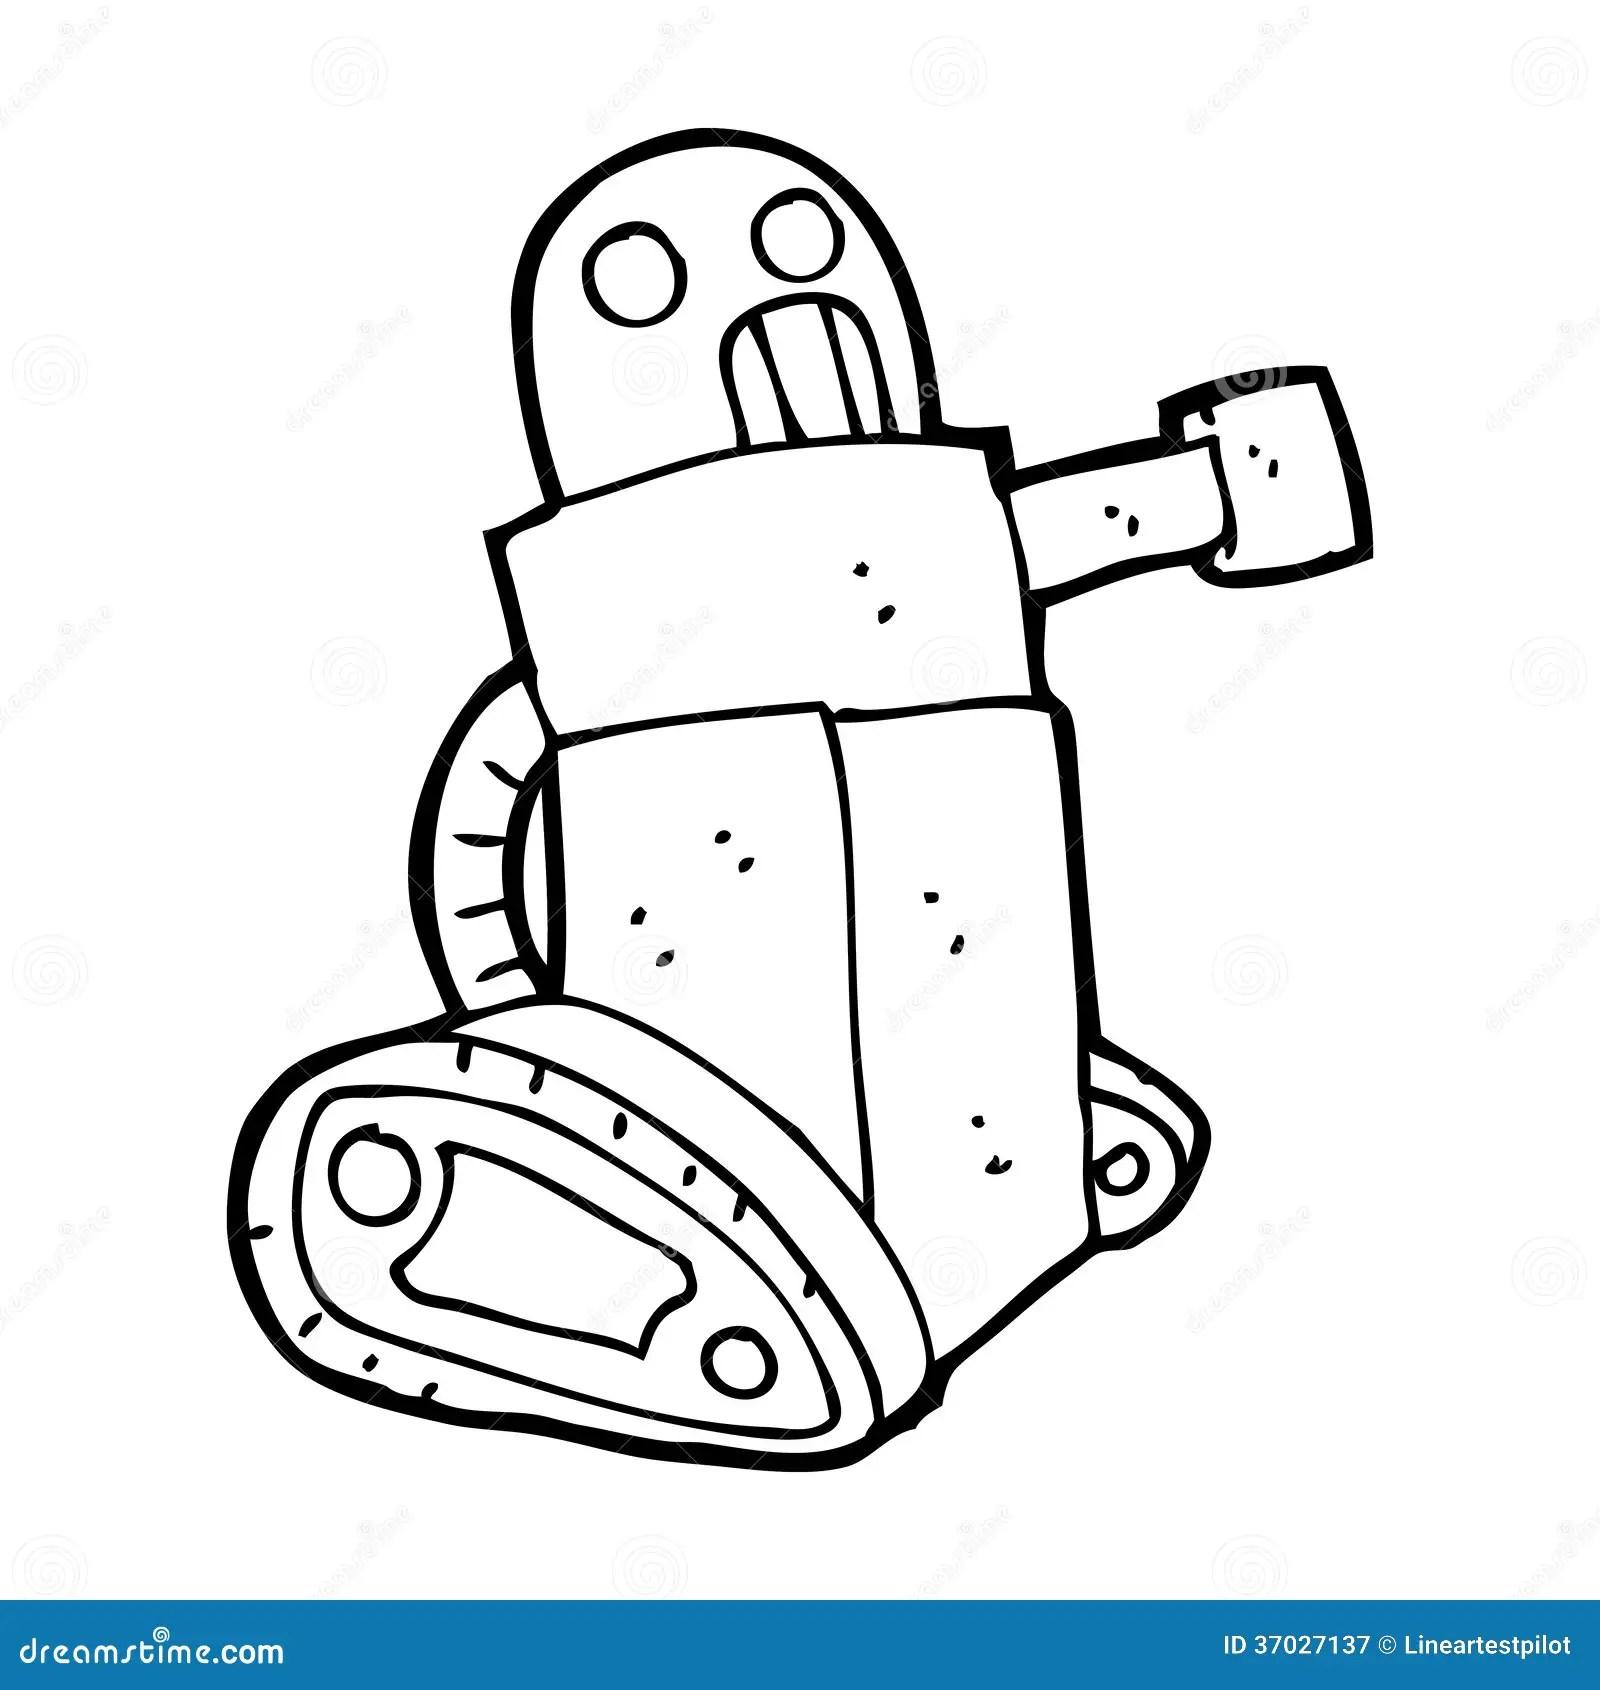 Cartoon Tank Robot Royalty Free Stock Photography